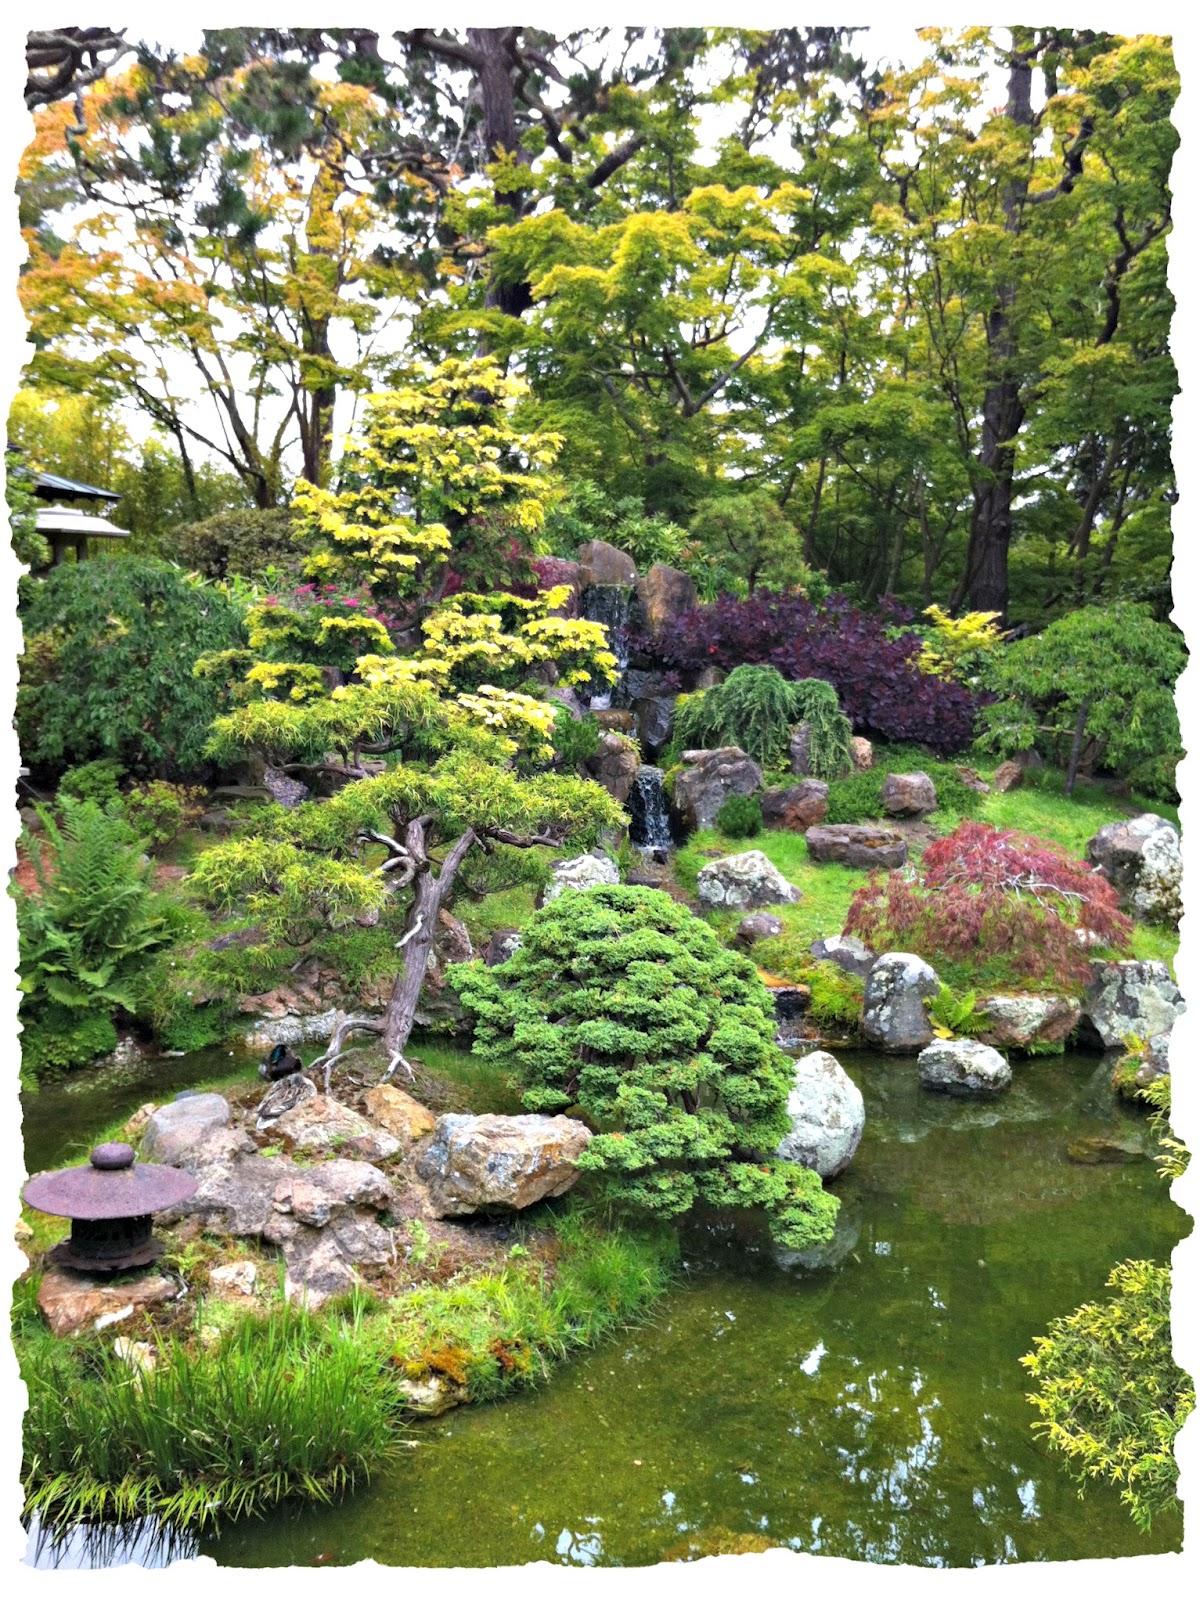 Man Caves Japanese Tea Garden : Rinis reisen japanese tea garden